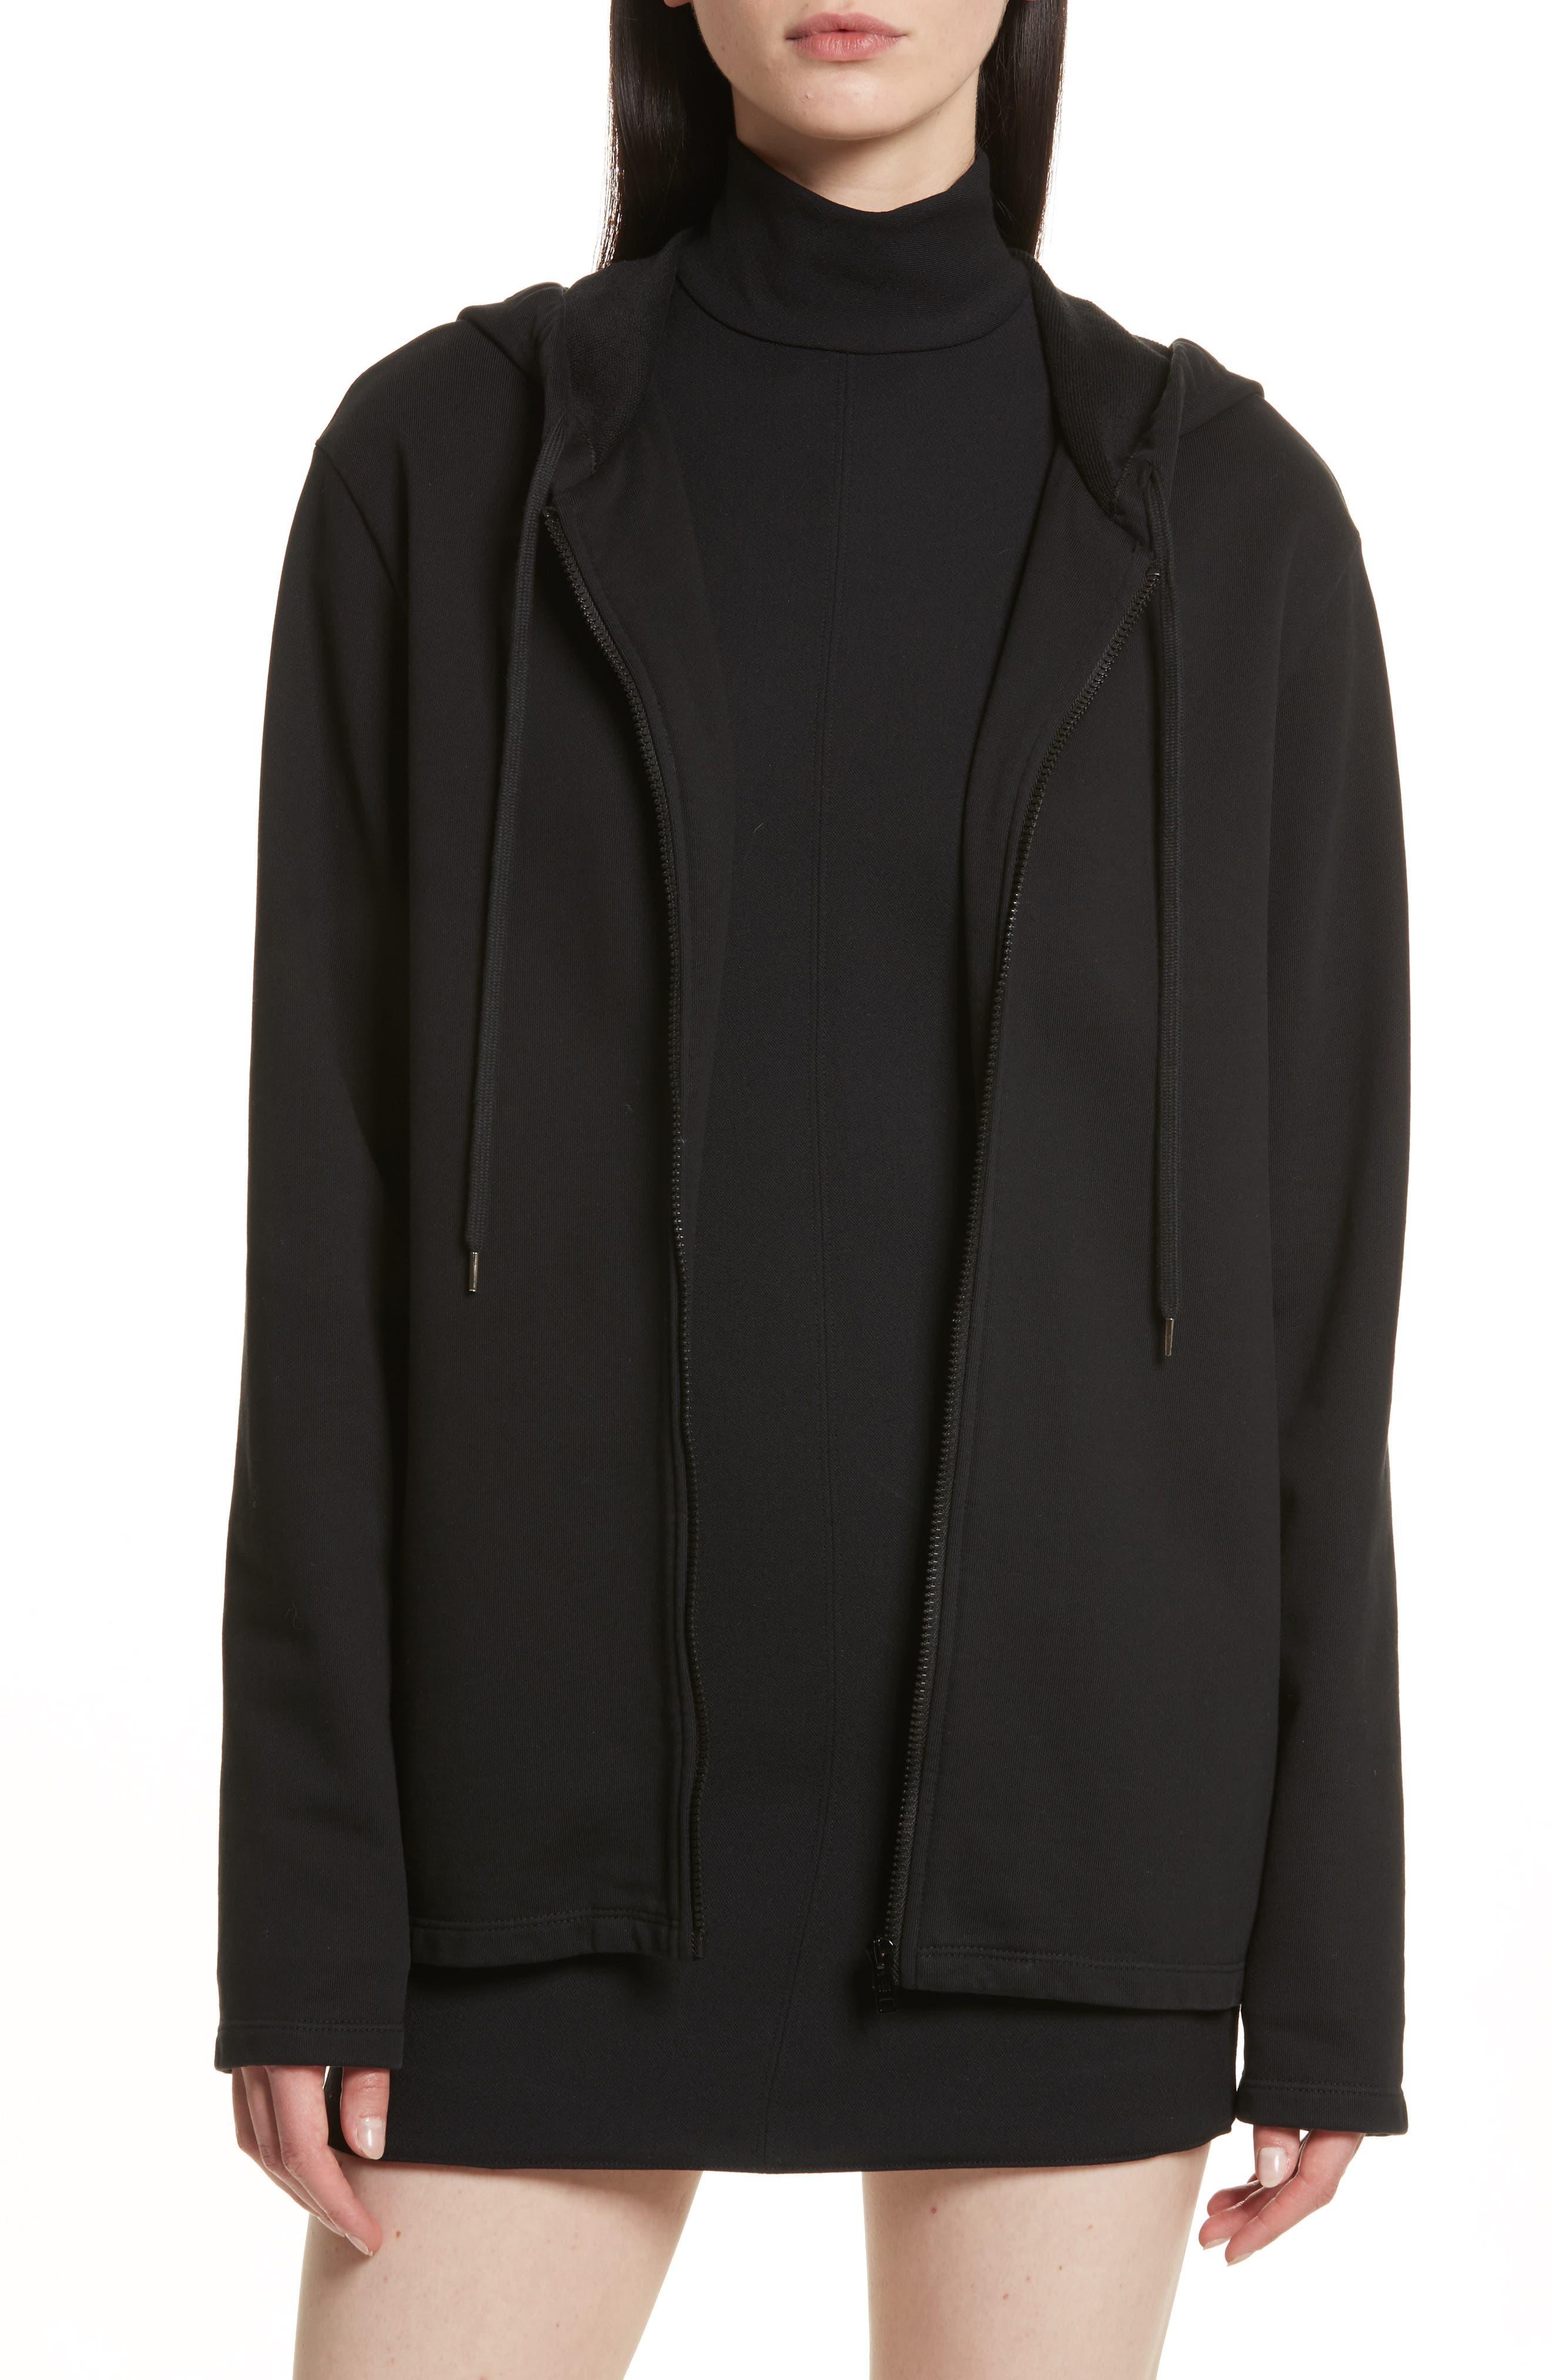 Alternate Image 1 Selected - Helmut Lang Re-Edition Stud Collar Hoodie